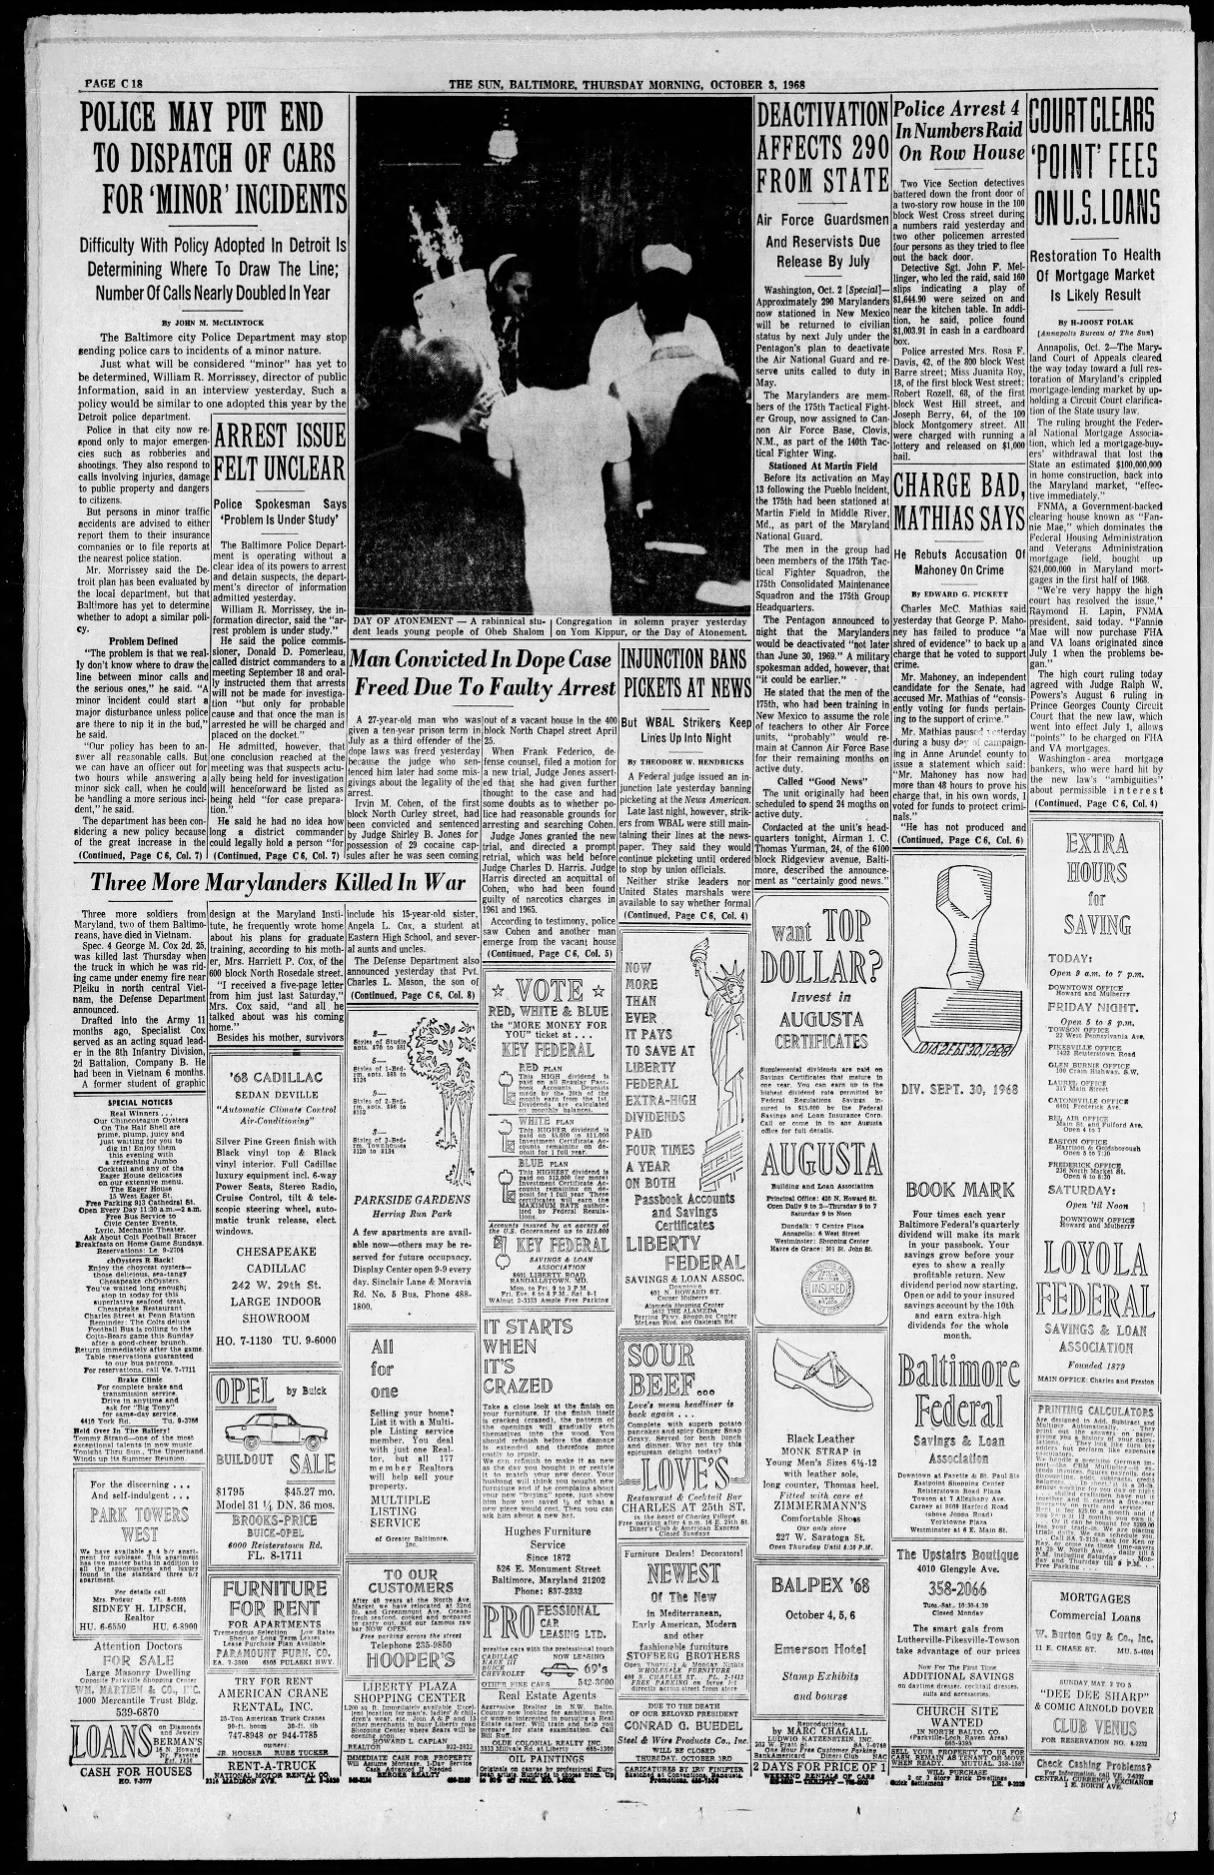 3_Oct_1968___George_M__Cox_killed___full_spread_page_1.jpg